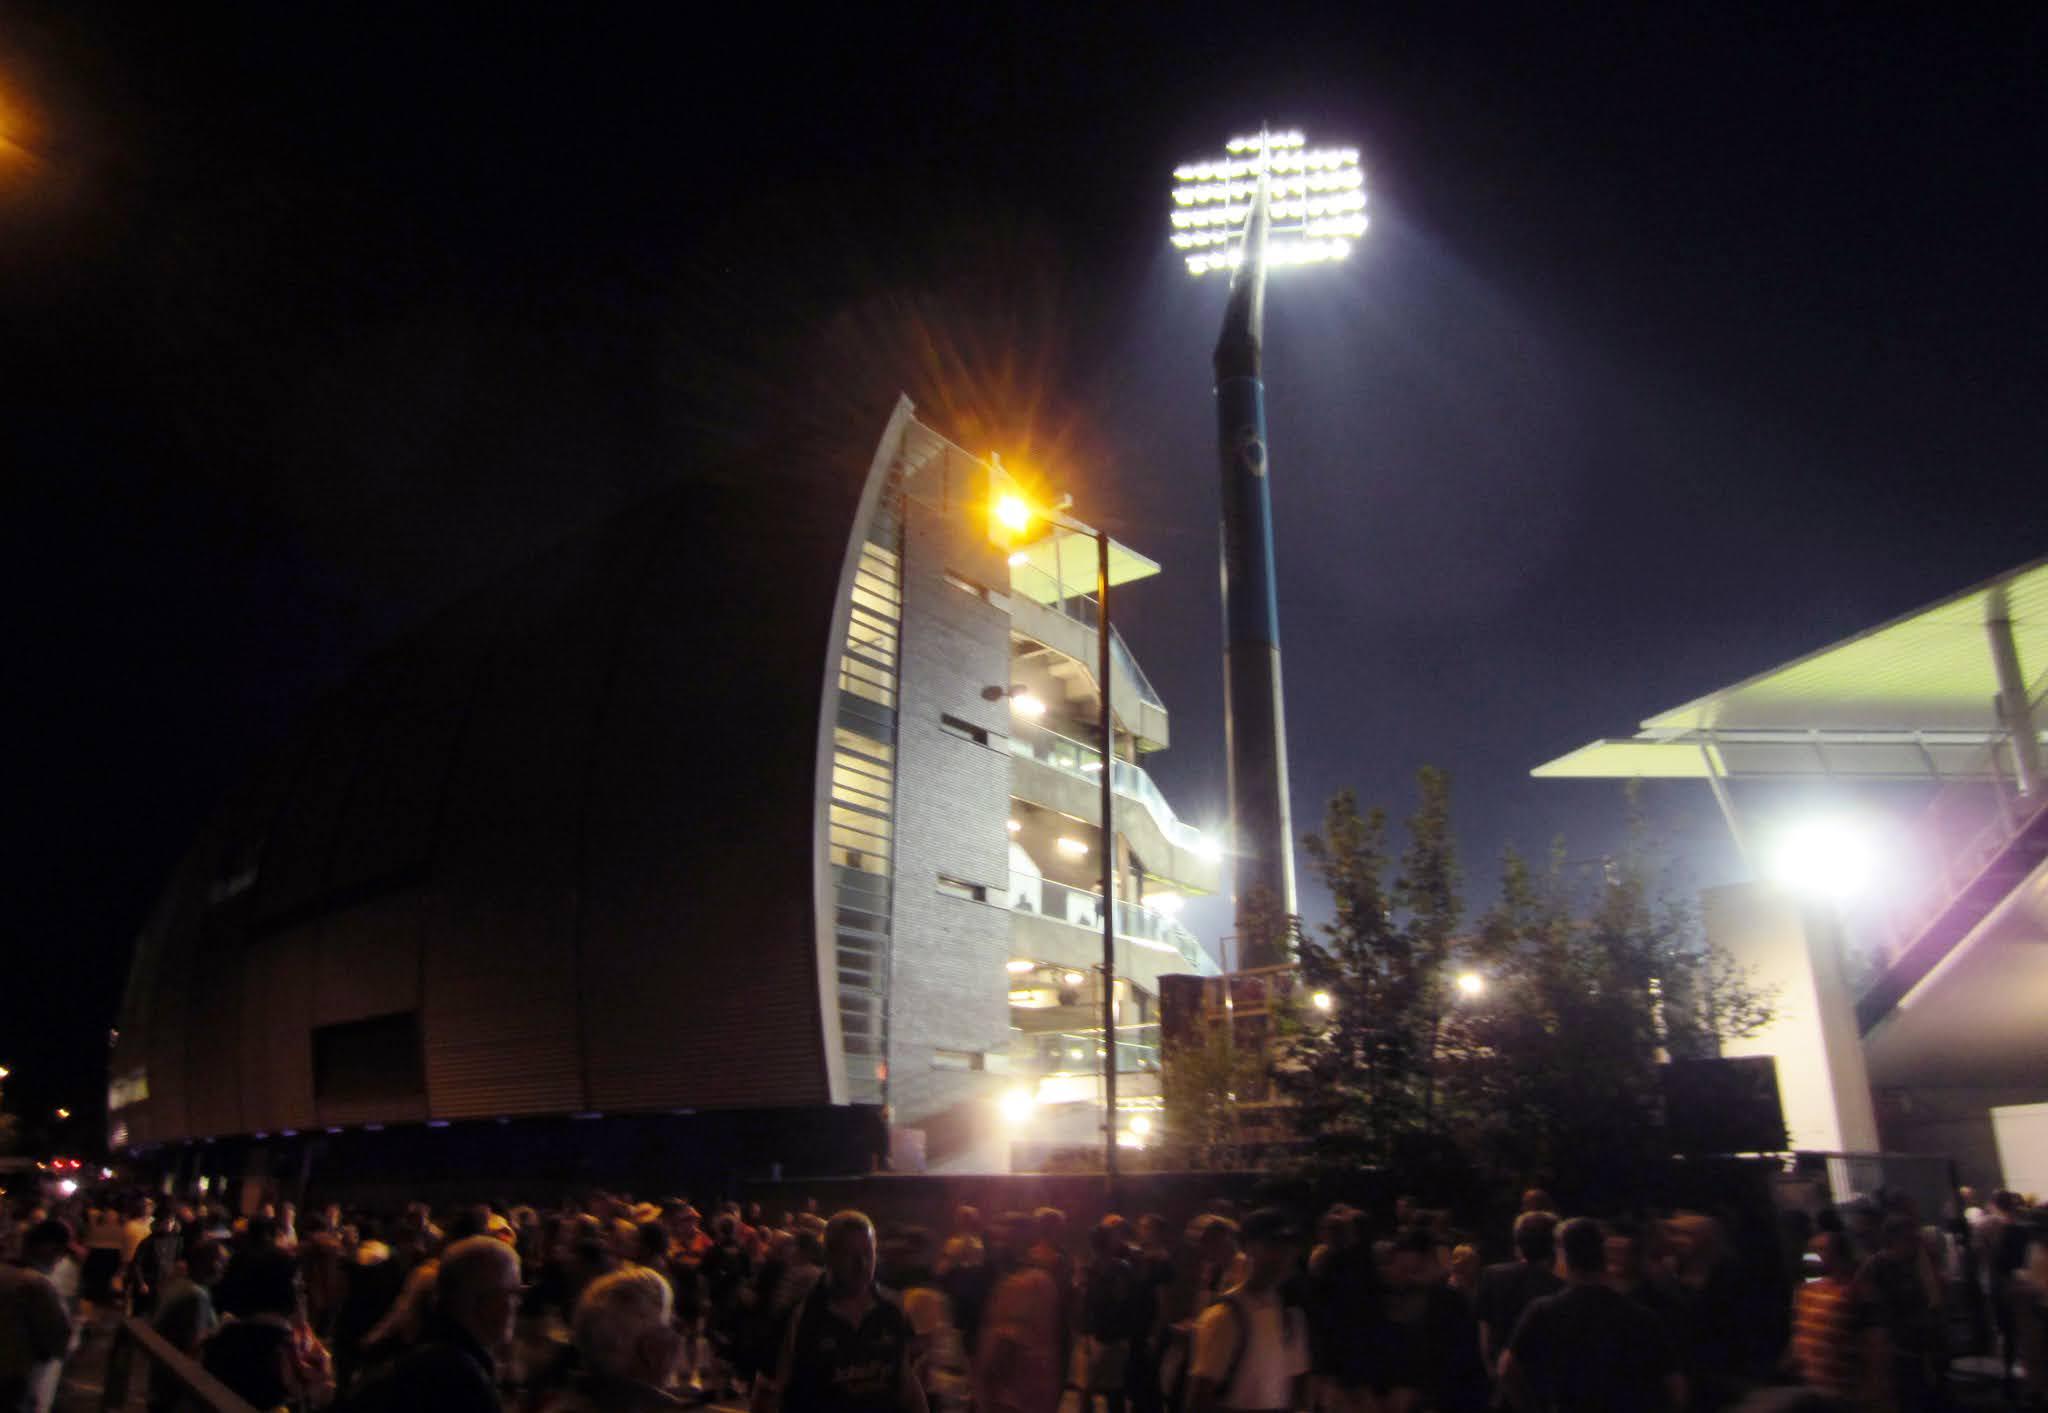 Edgbaston Stadium exterior at night